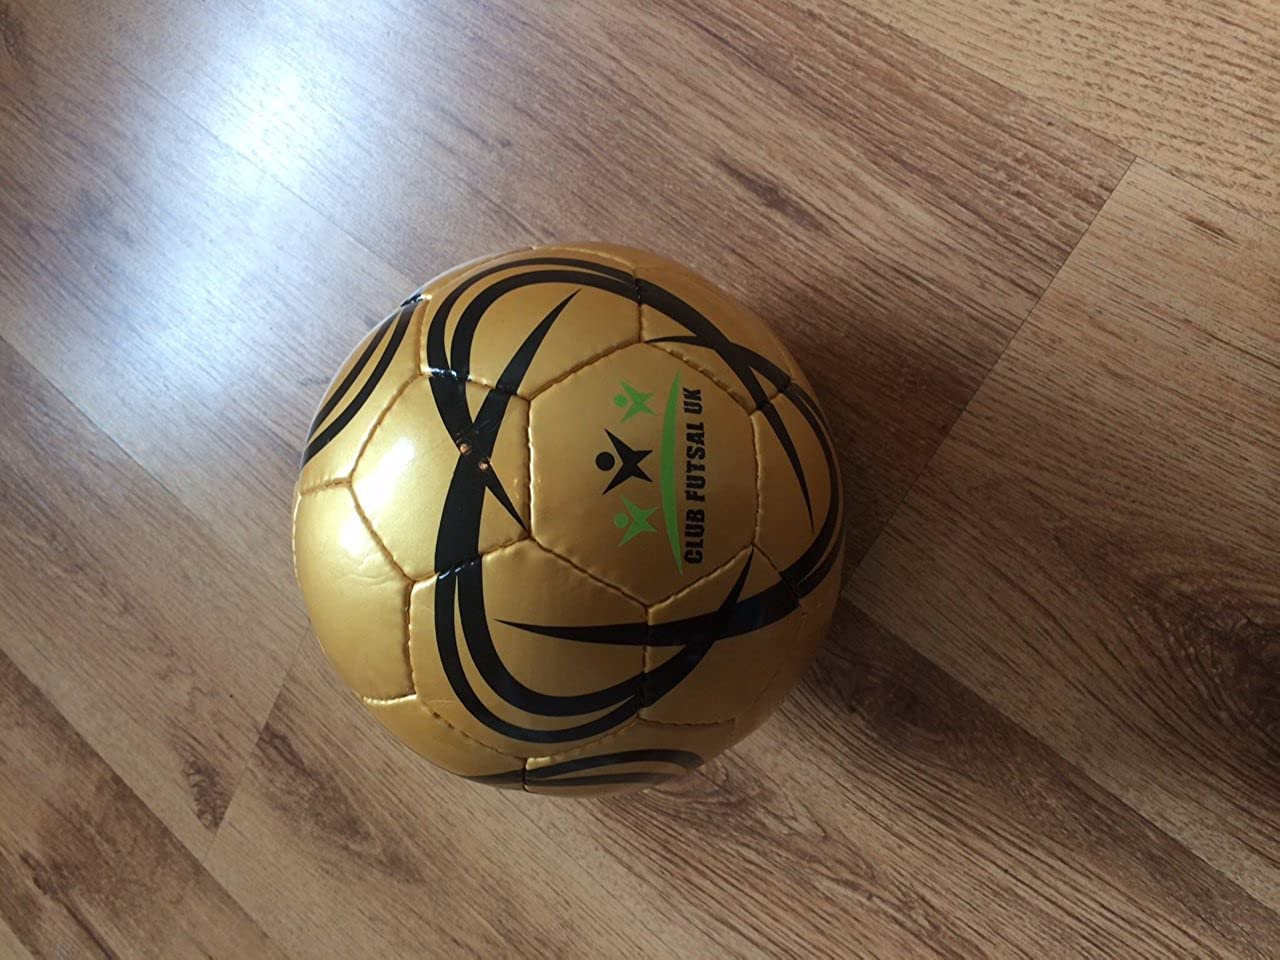 ClubFutsalUK Ballon de Futsal Taille 3 Size 3gold